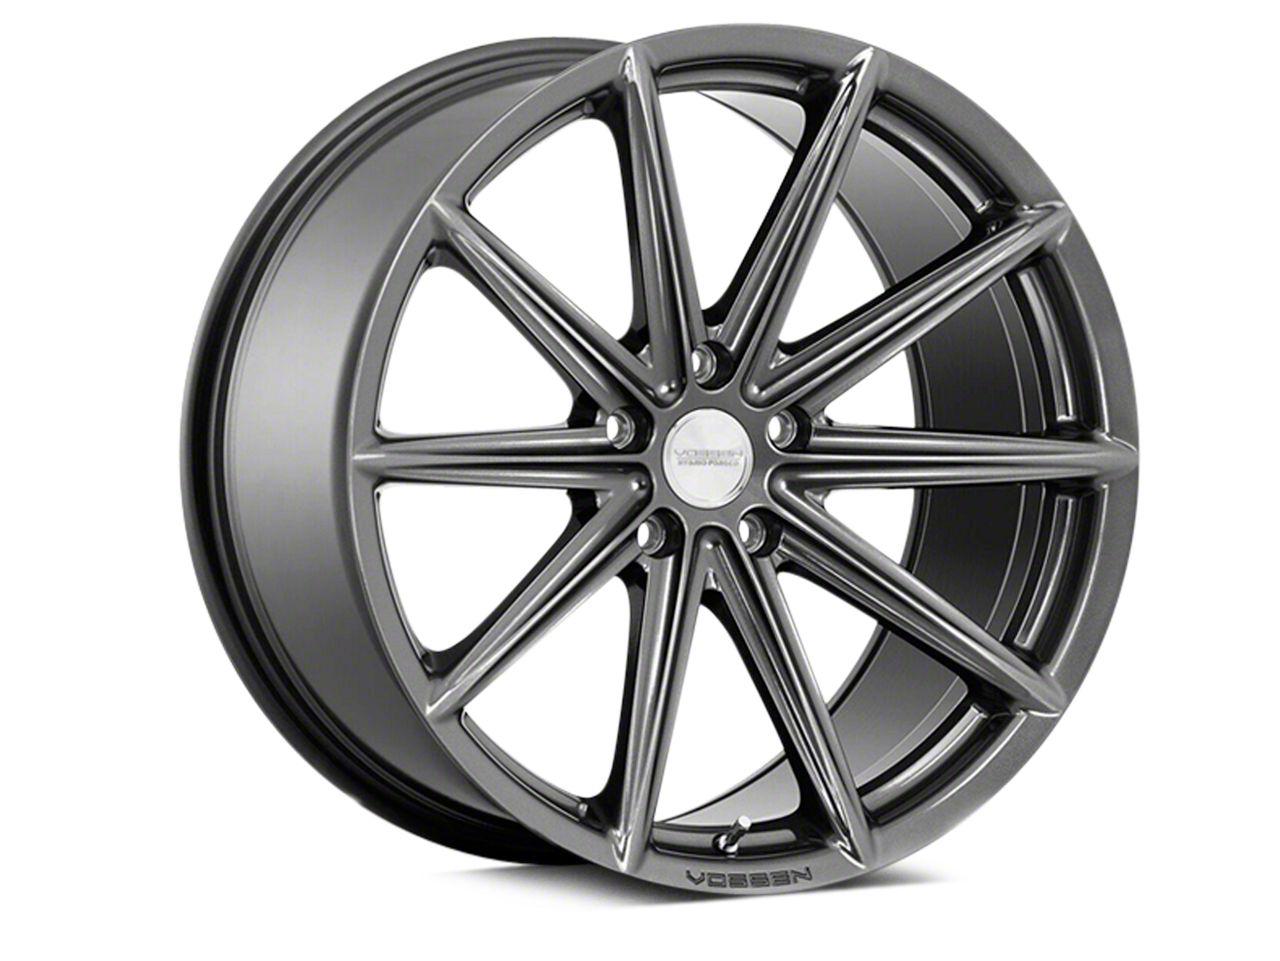 Vossen VFS-10 Gloss Graphite Wheel - 20x10.5 - Rear Only (15-19 All)